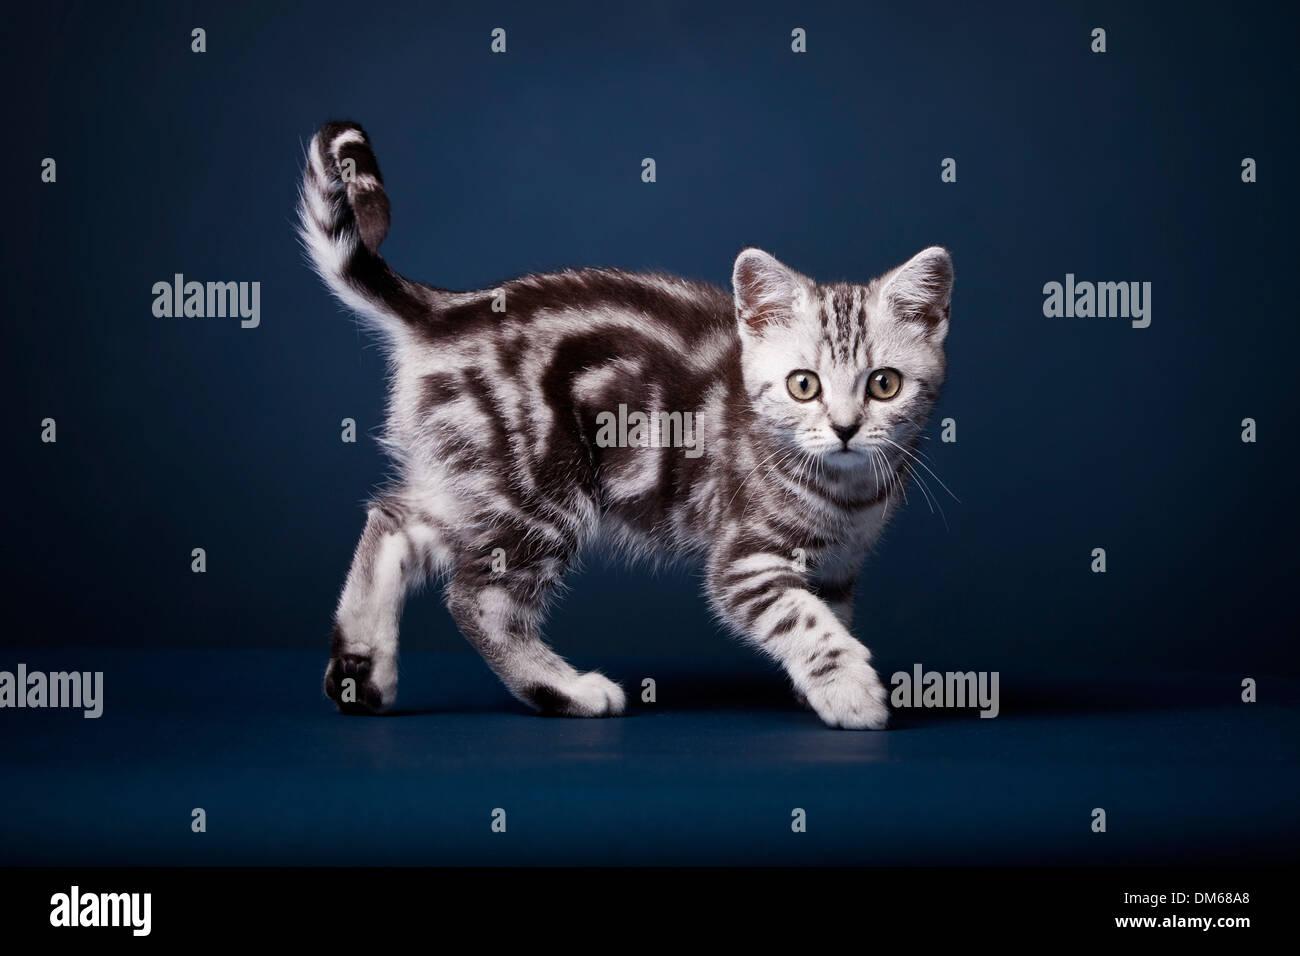 British Shorthair Cat Kitten Black Silver Tabby 3 Months Stock Photo Alamy